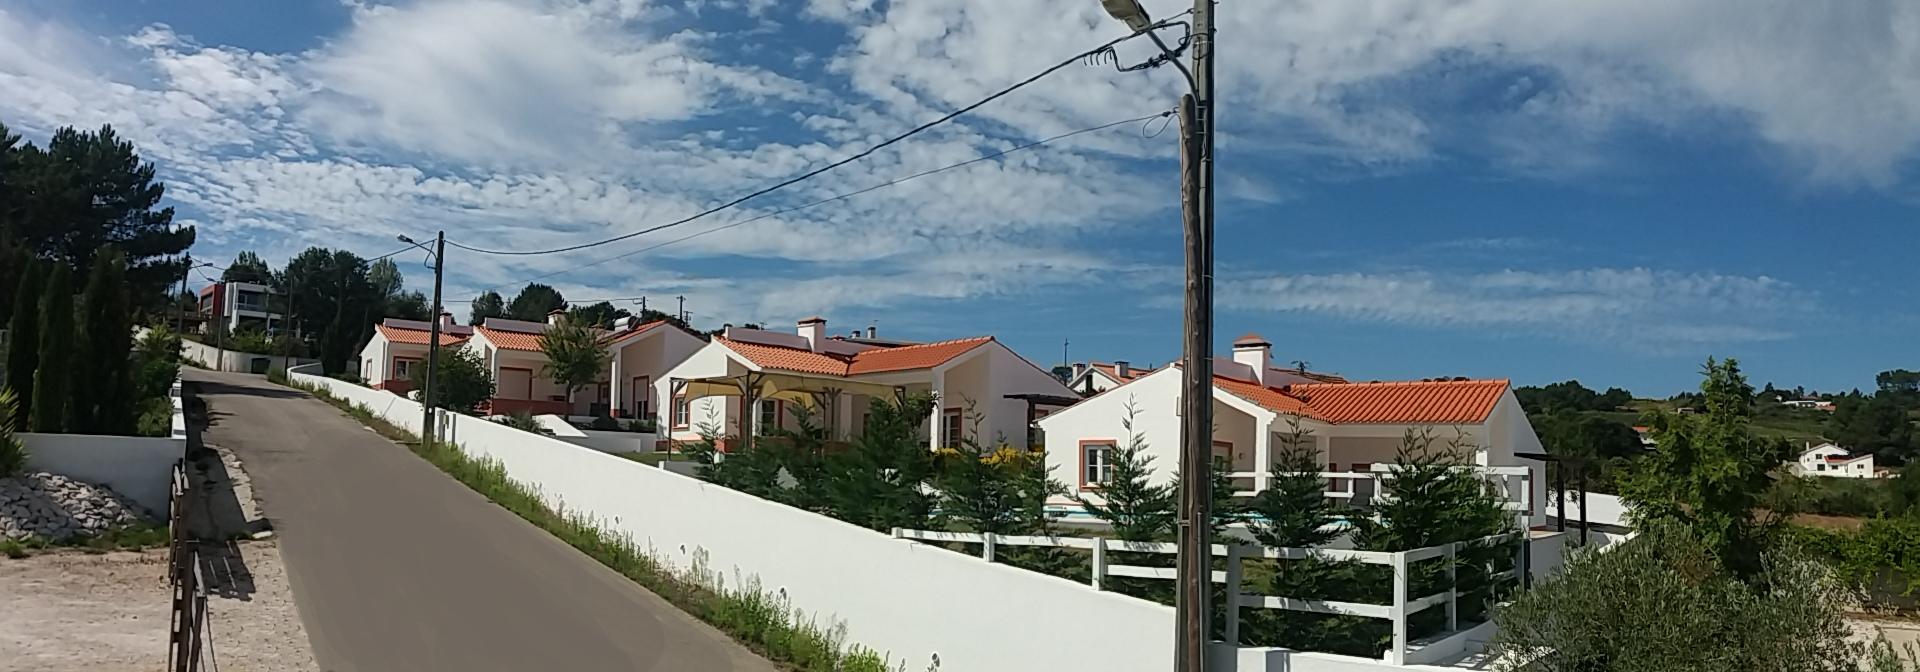 De ligging van de casas